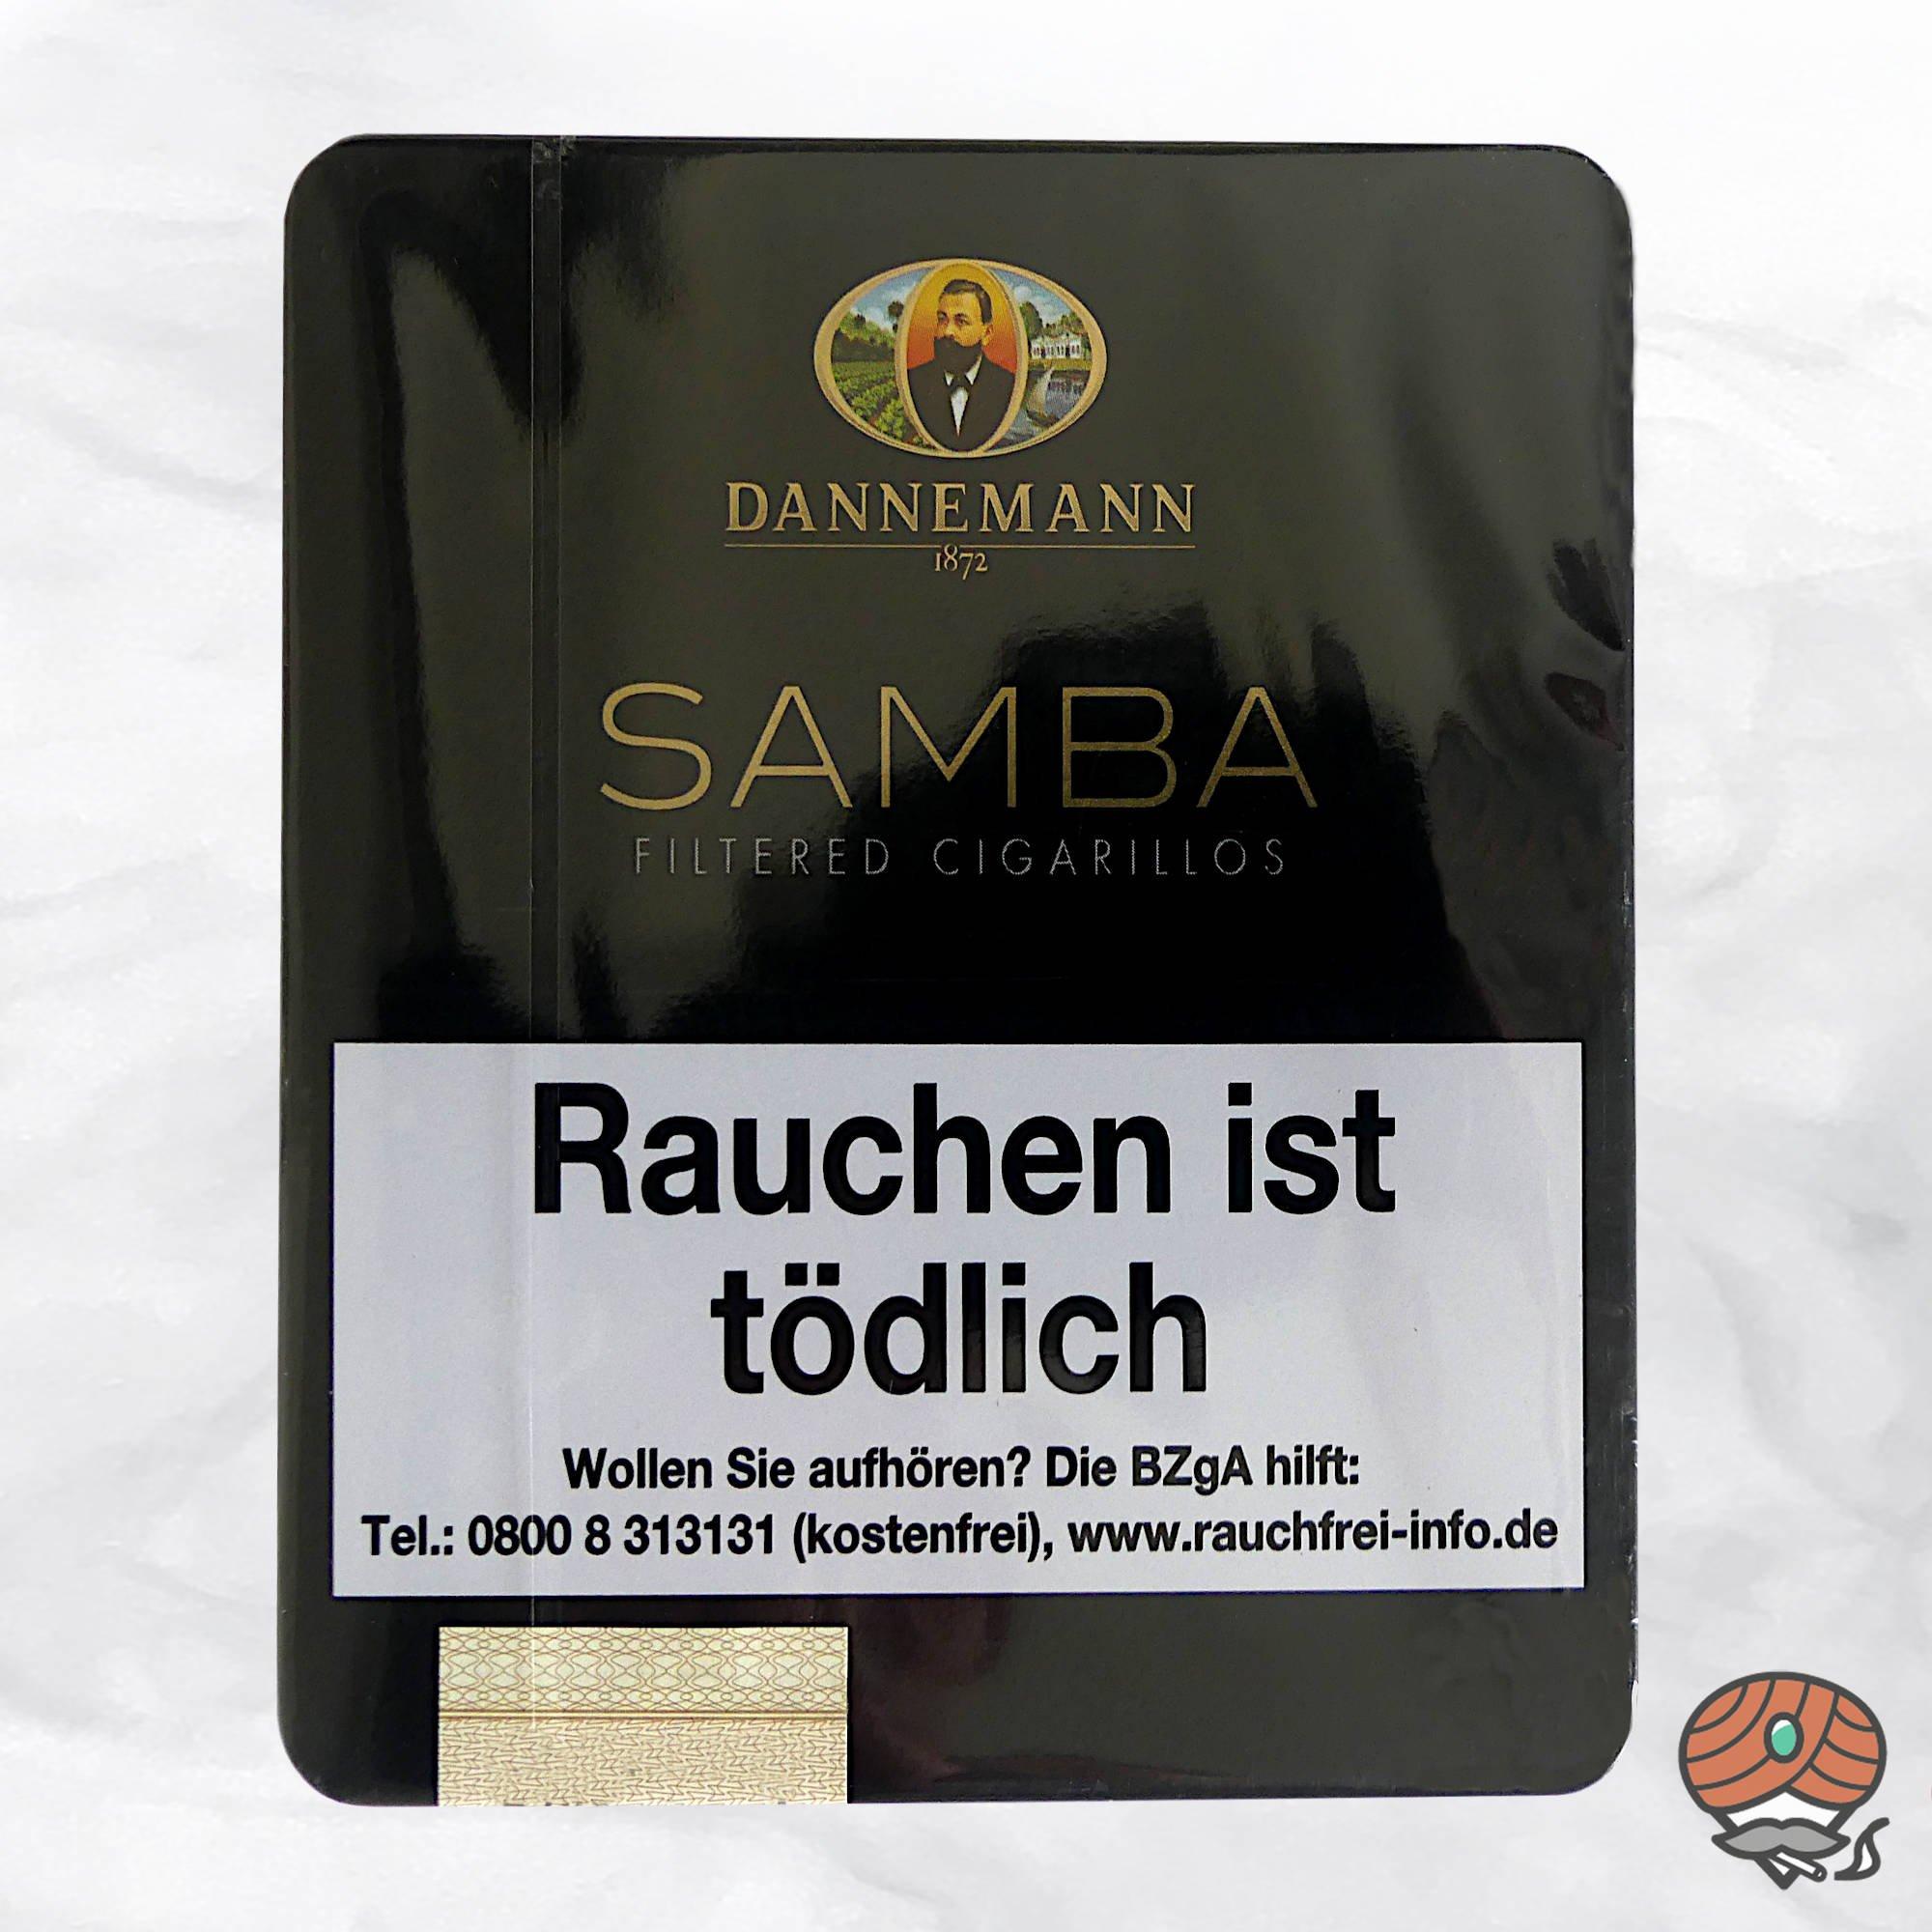 Dannemann Samba Filter Zigarillos 10 Stück